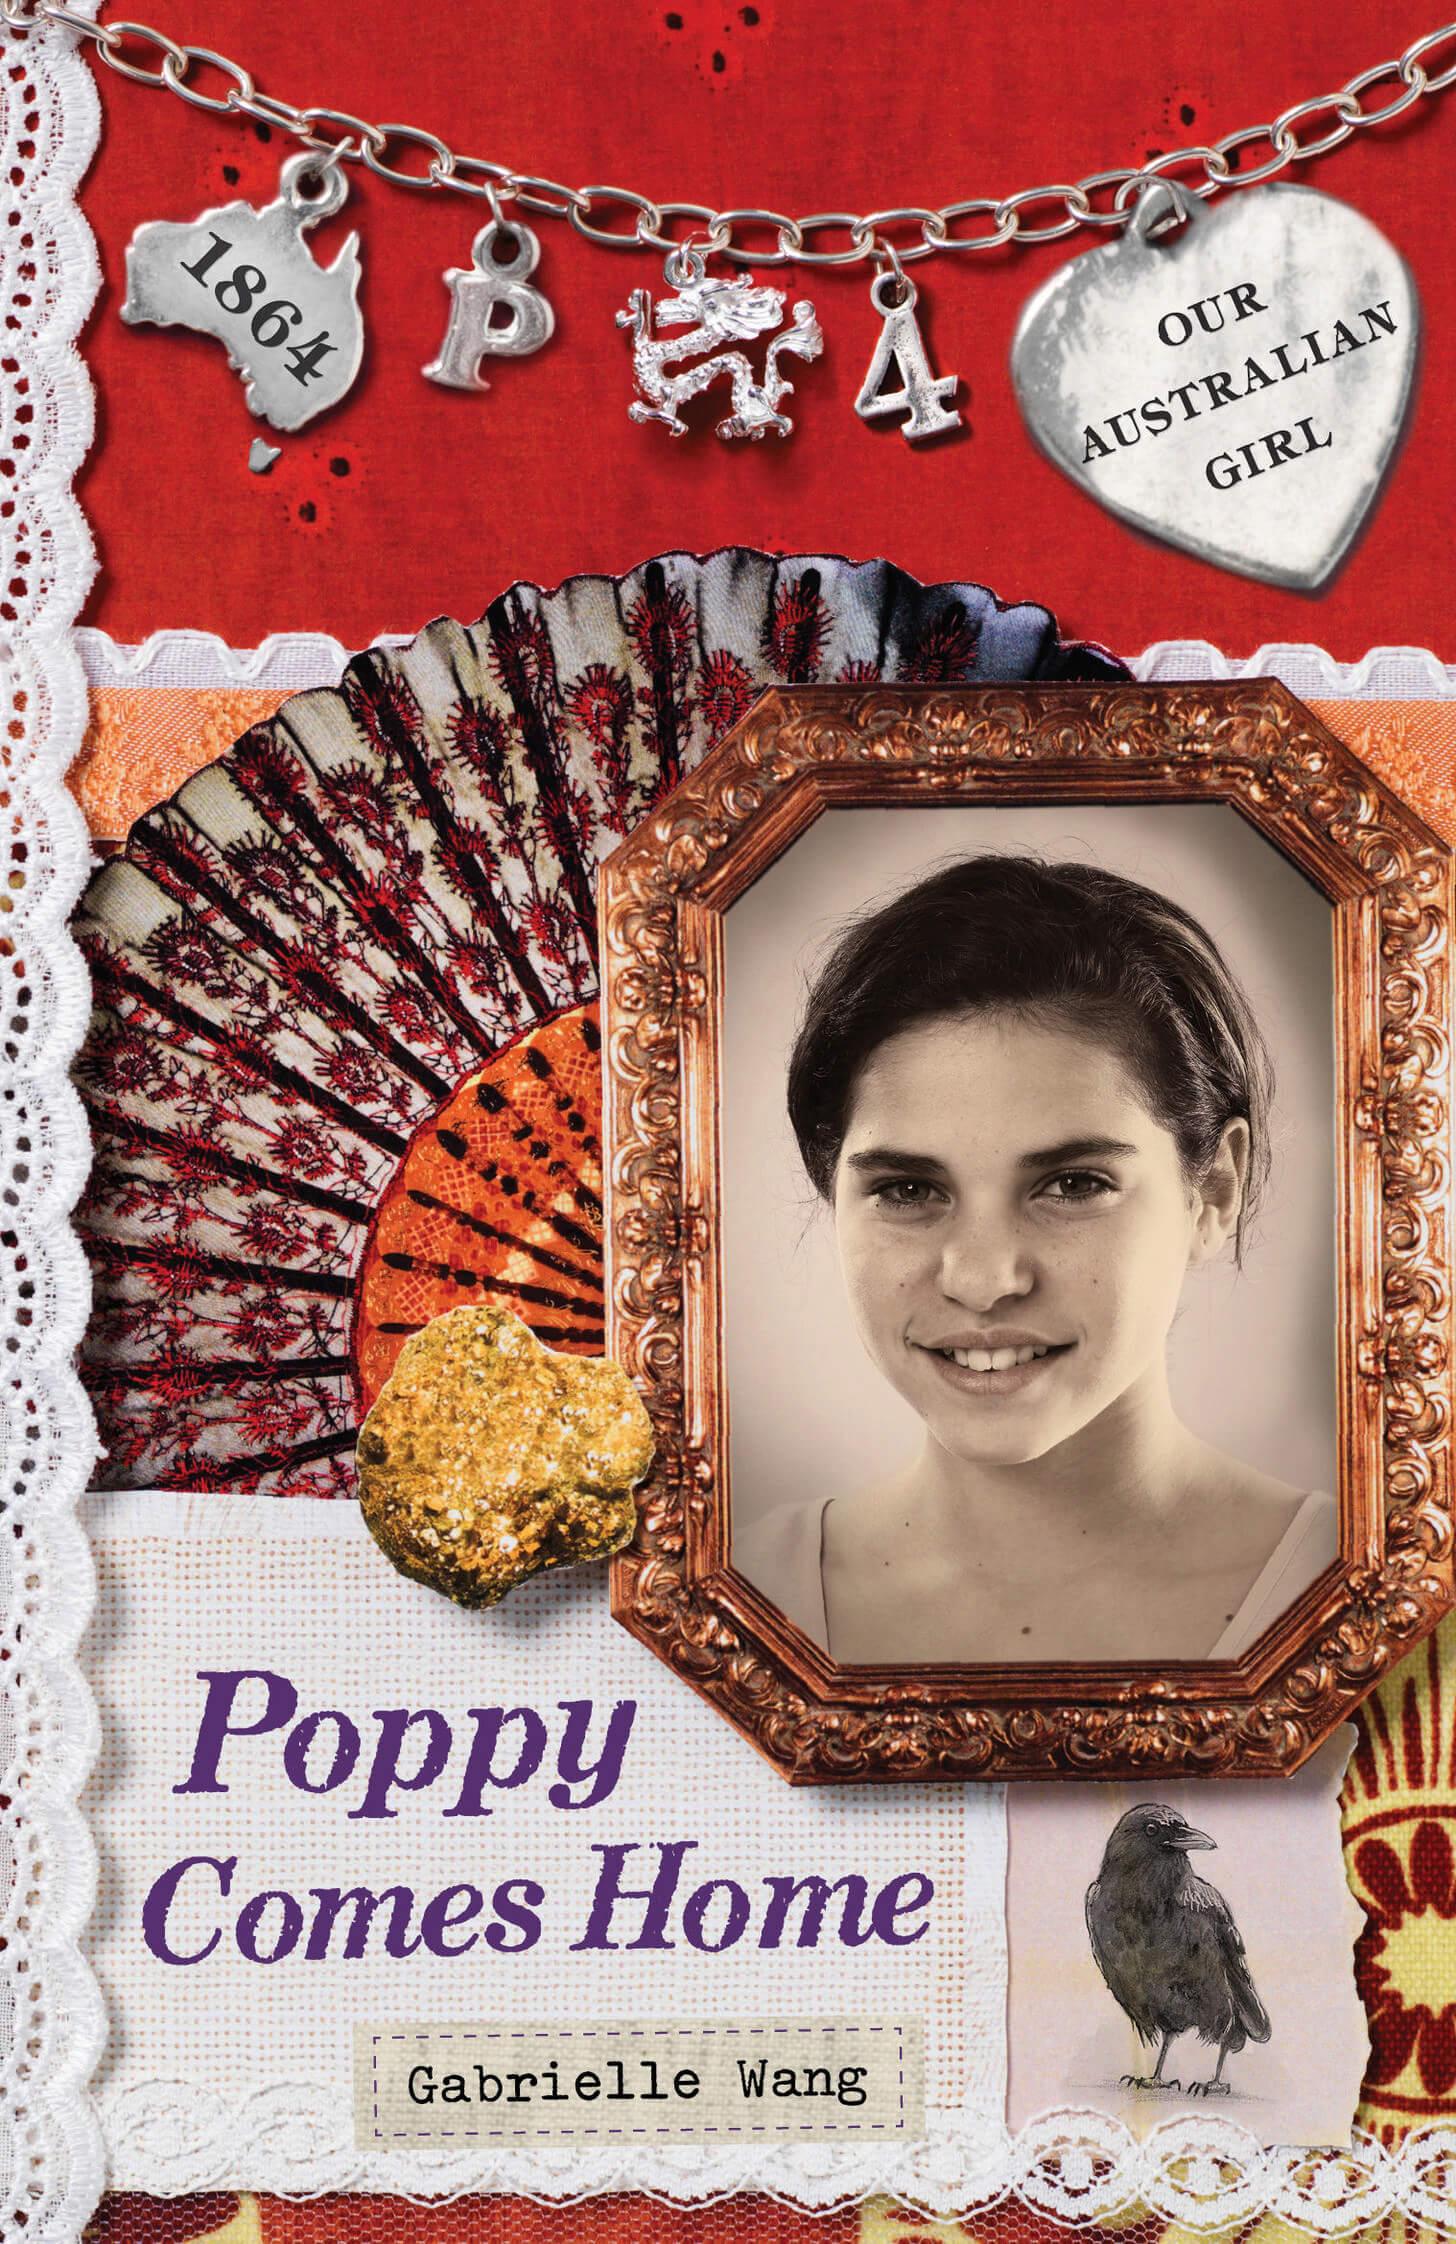 Poppy Comes Home